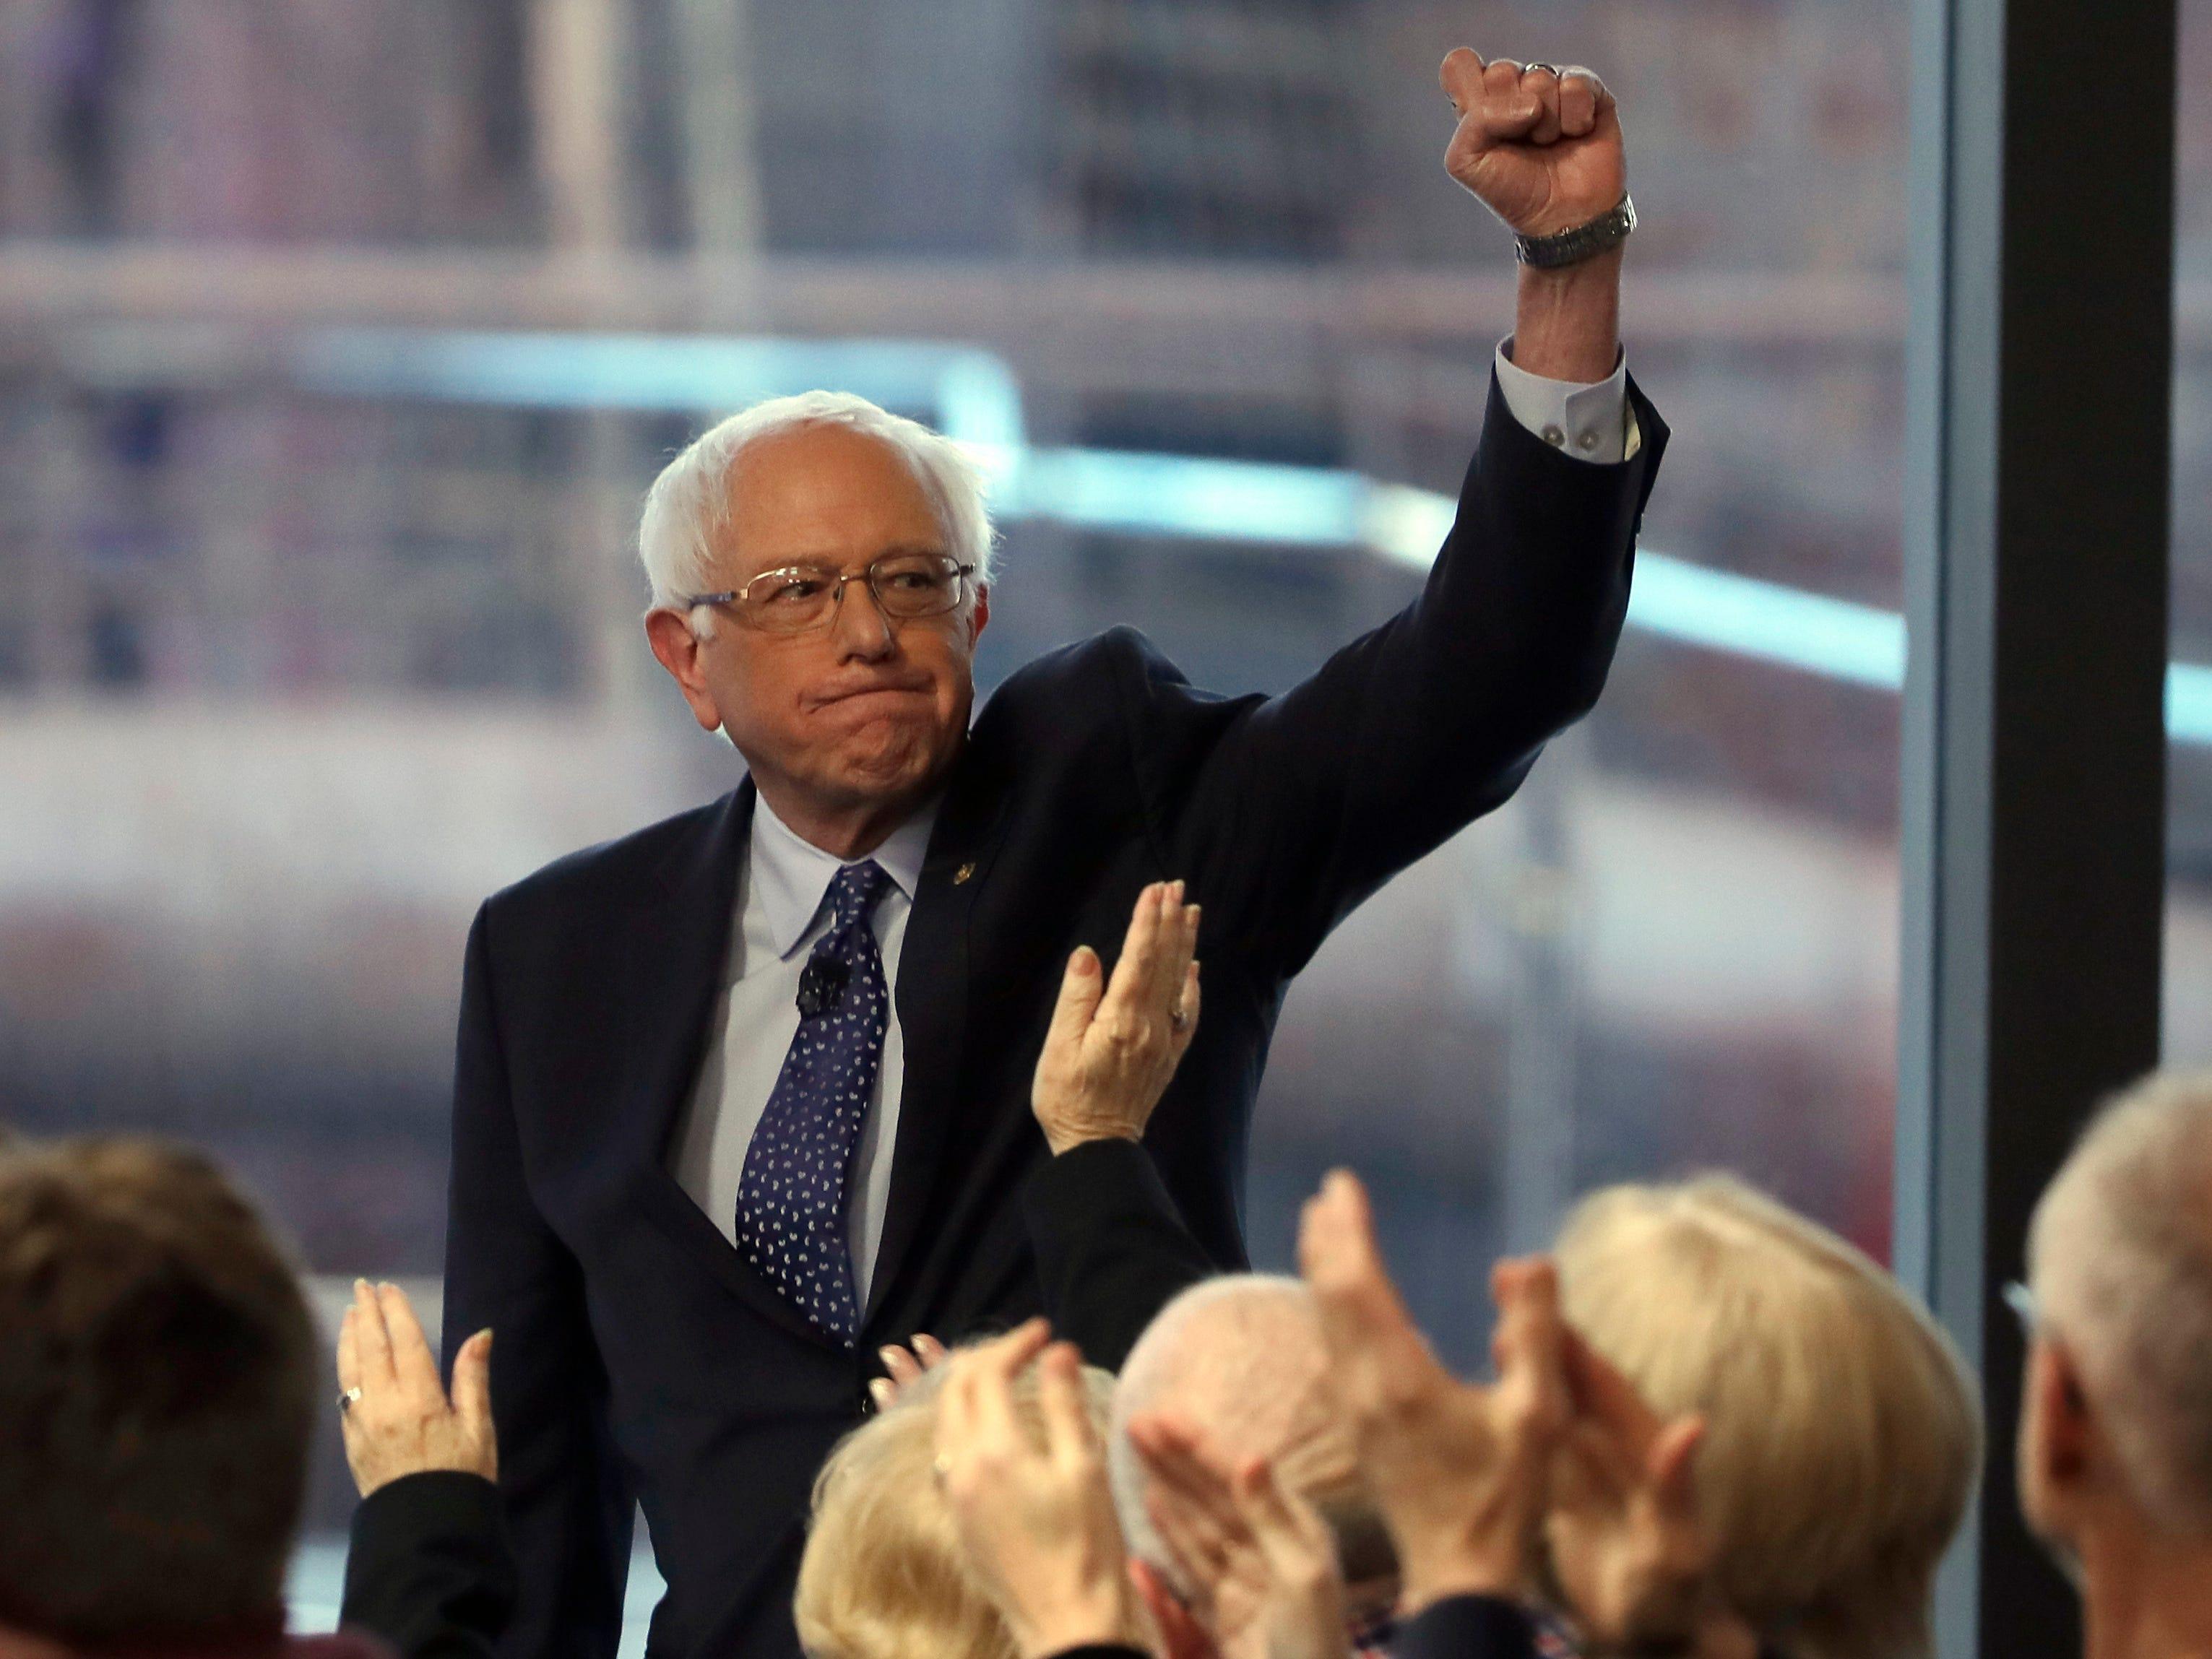 Bernie Sanders leads Joe Biden in Emerson national poll of 2020 contenders